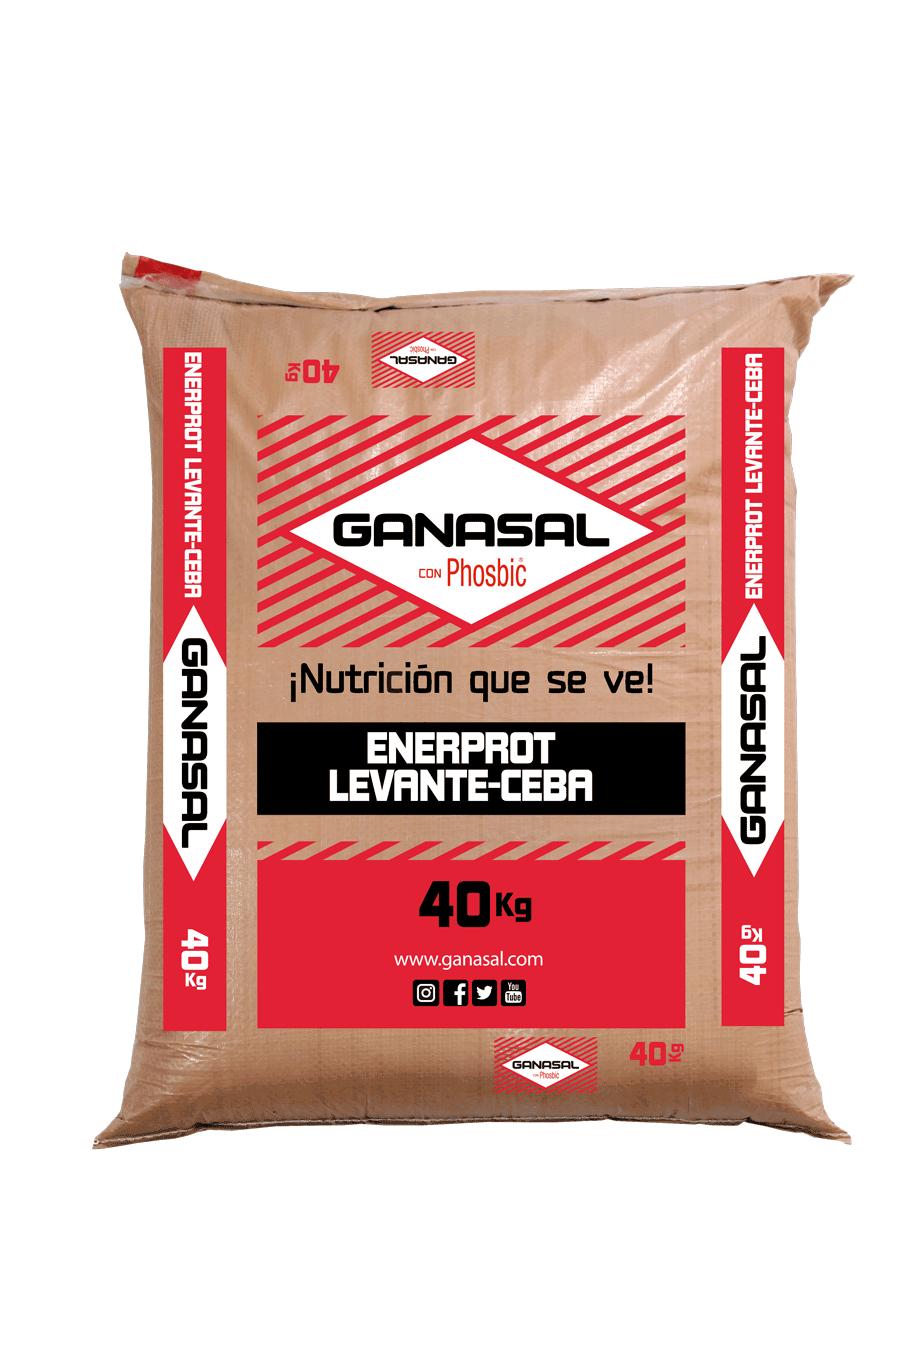 Enerprot-Levante-Ceba-Ganasal.png